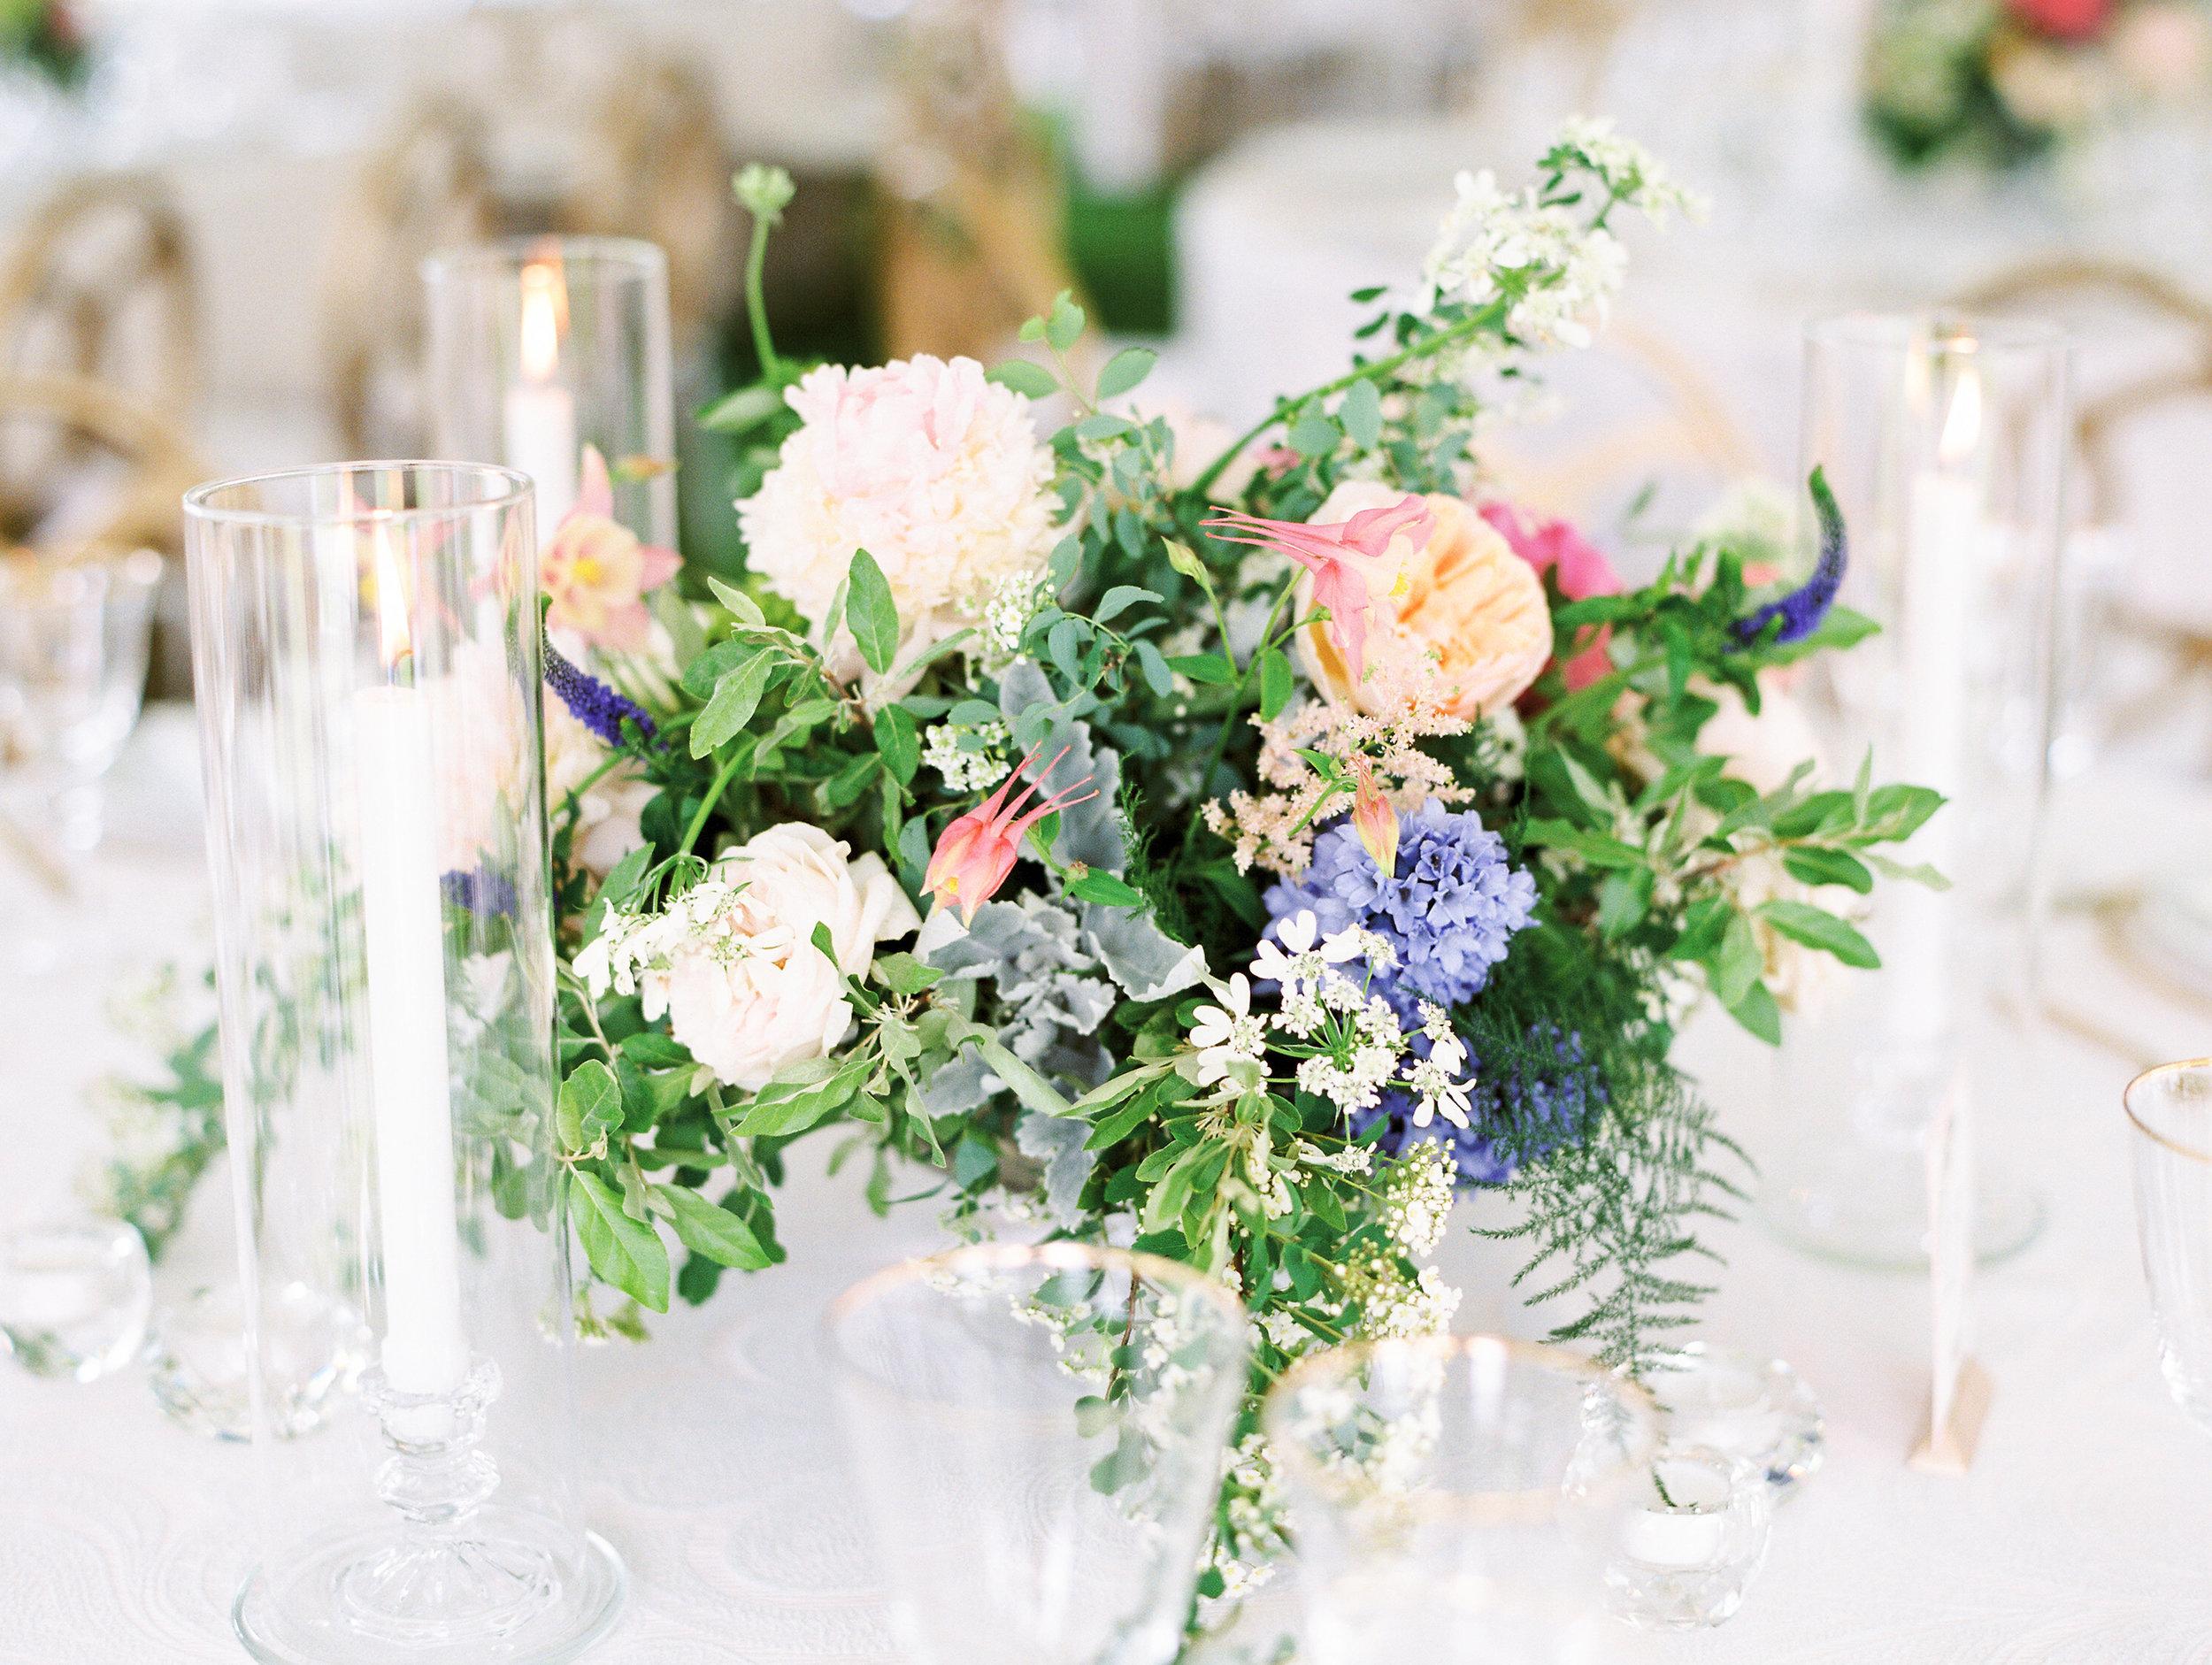 Coffman+Wedding+Reception+Details-66.jpg